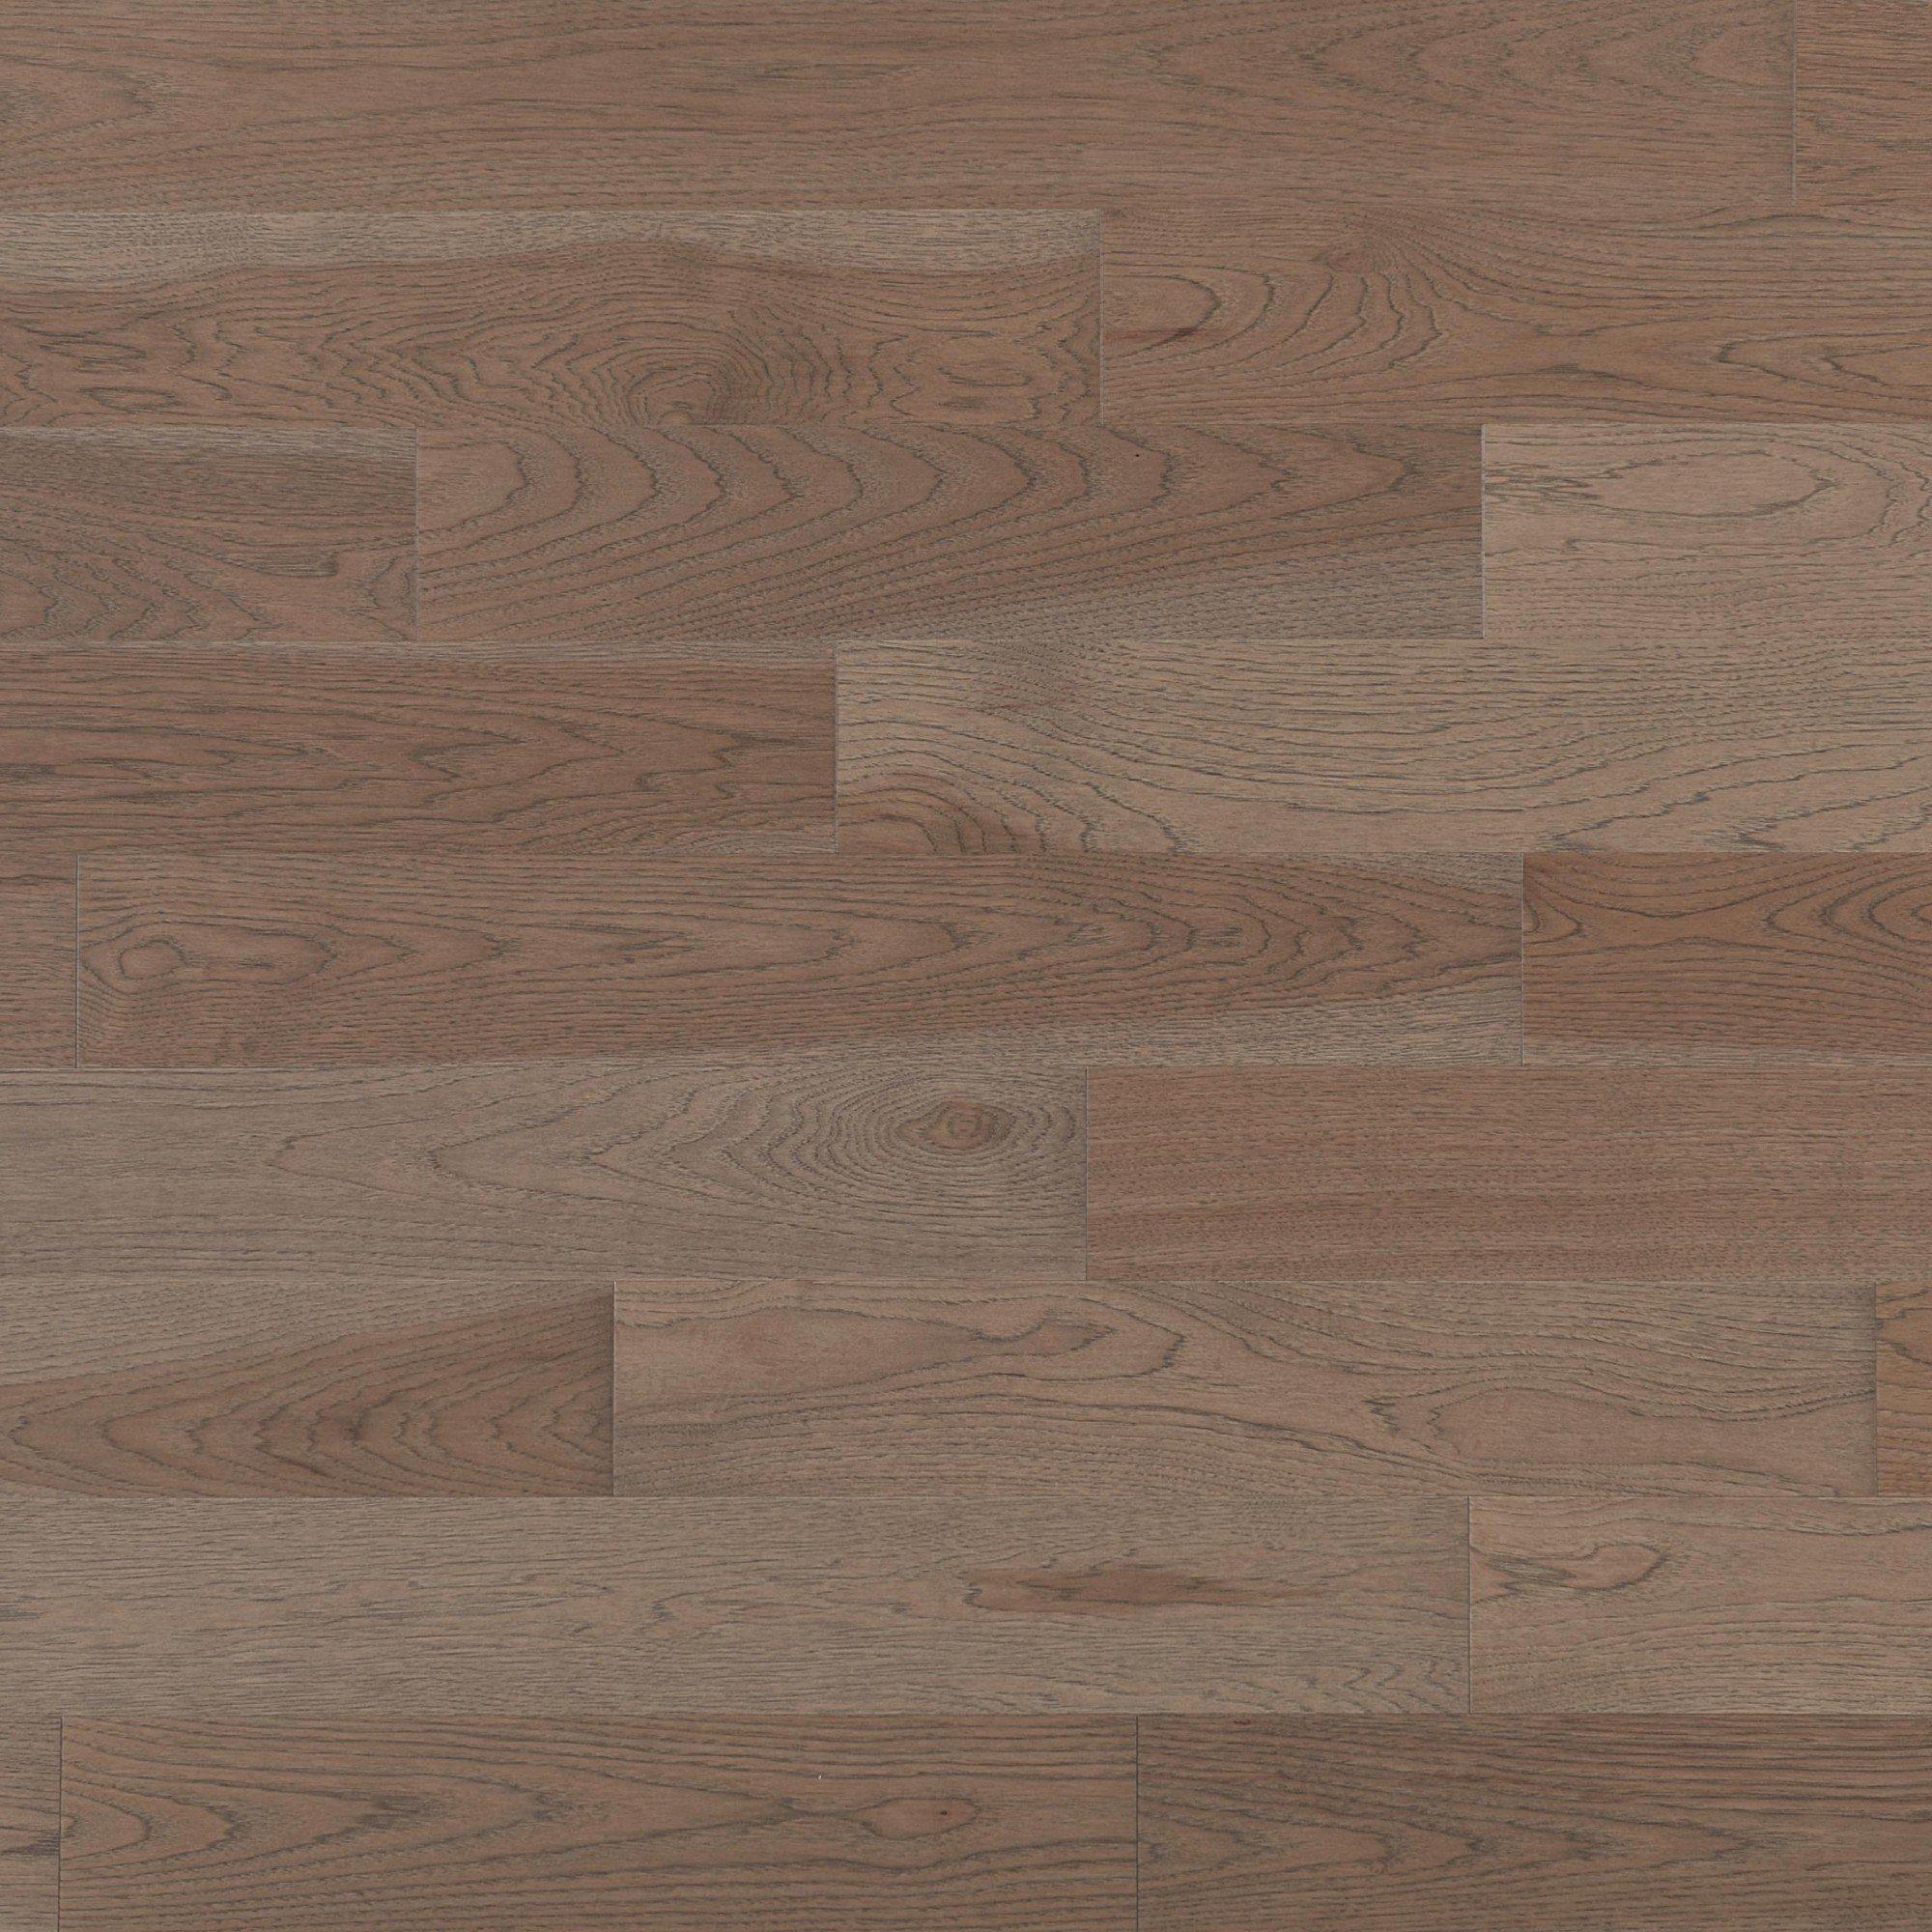 Hickory Greystone - Image plancher